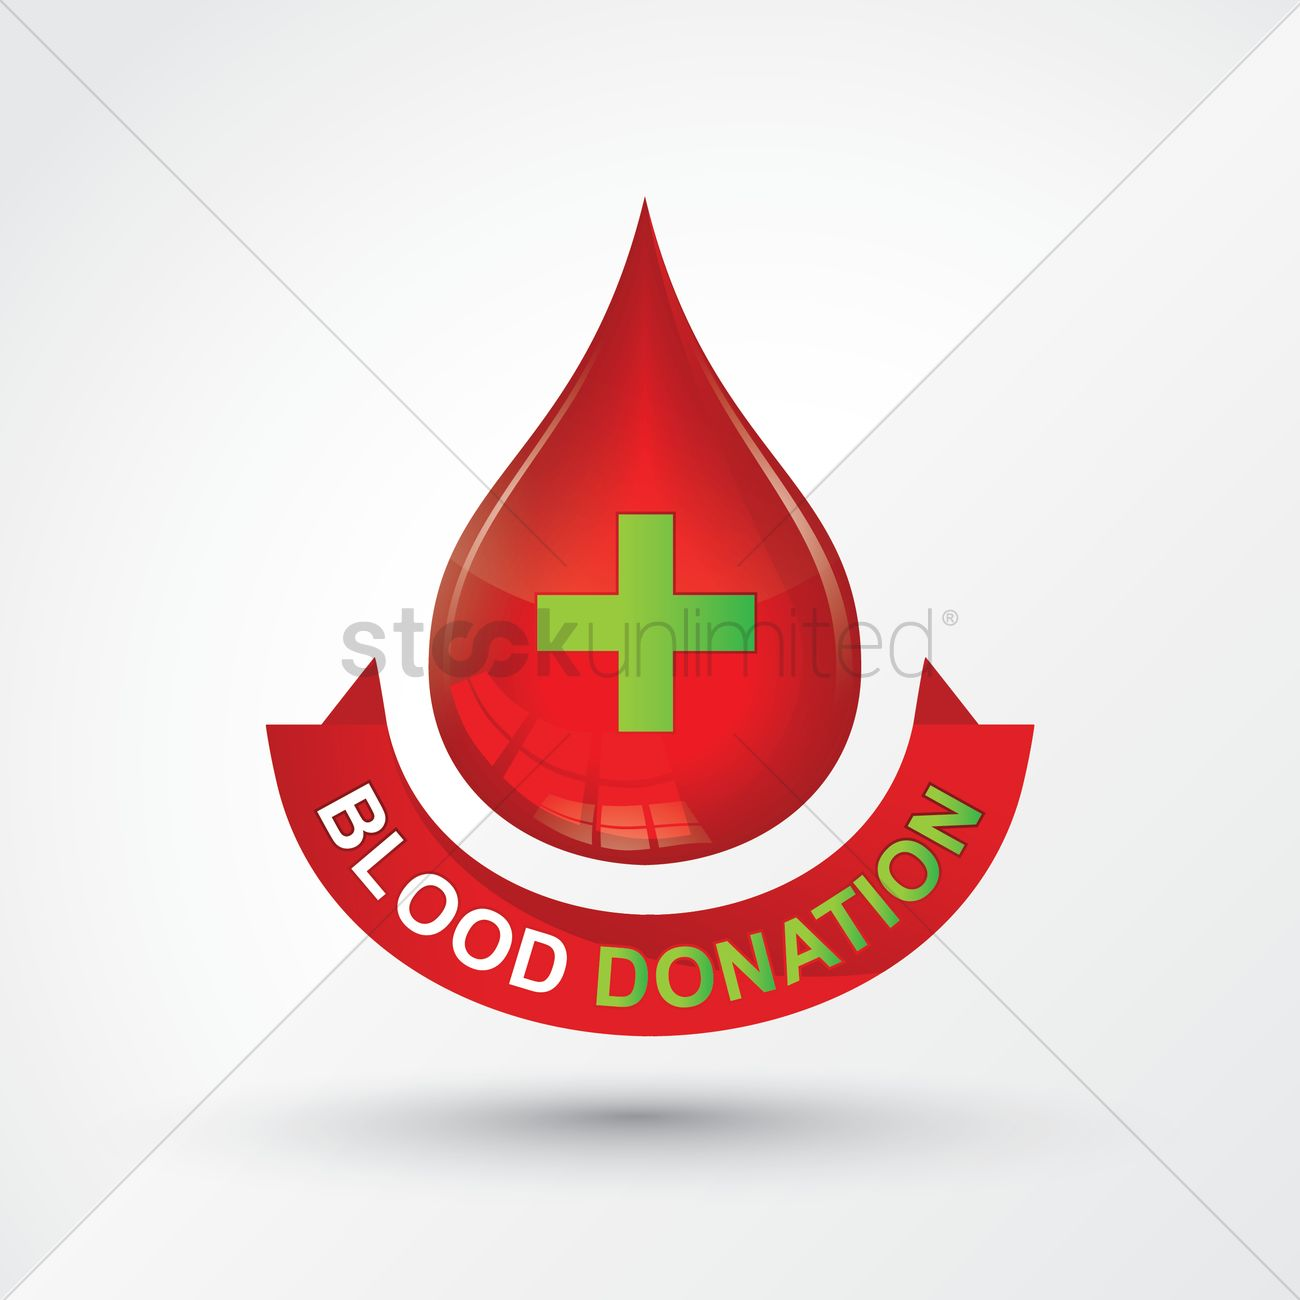 Free blood donation banner vector image 1481532 stockunlimited free blood donation banner vector graphic buycottarizona